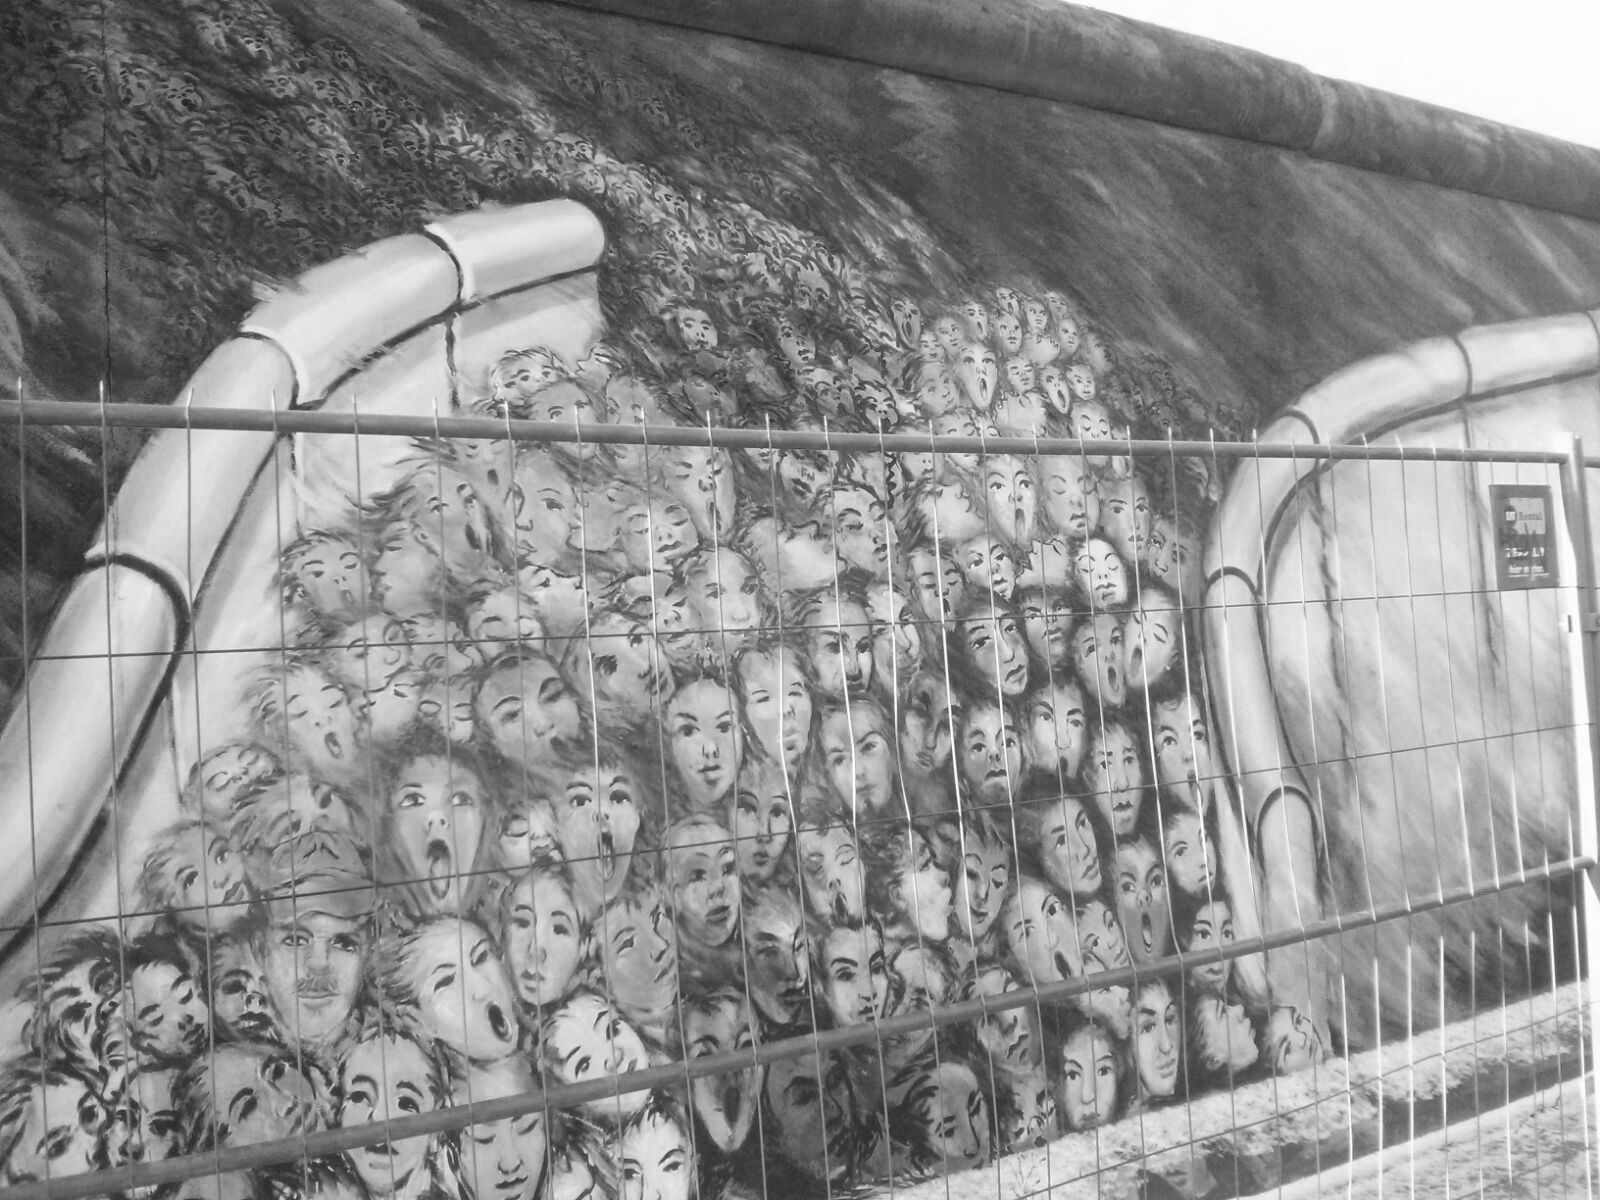 berlin-mural-3-bw